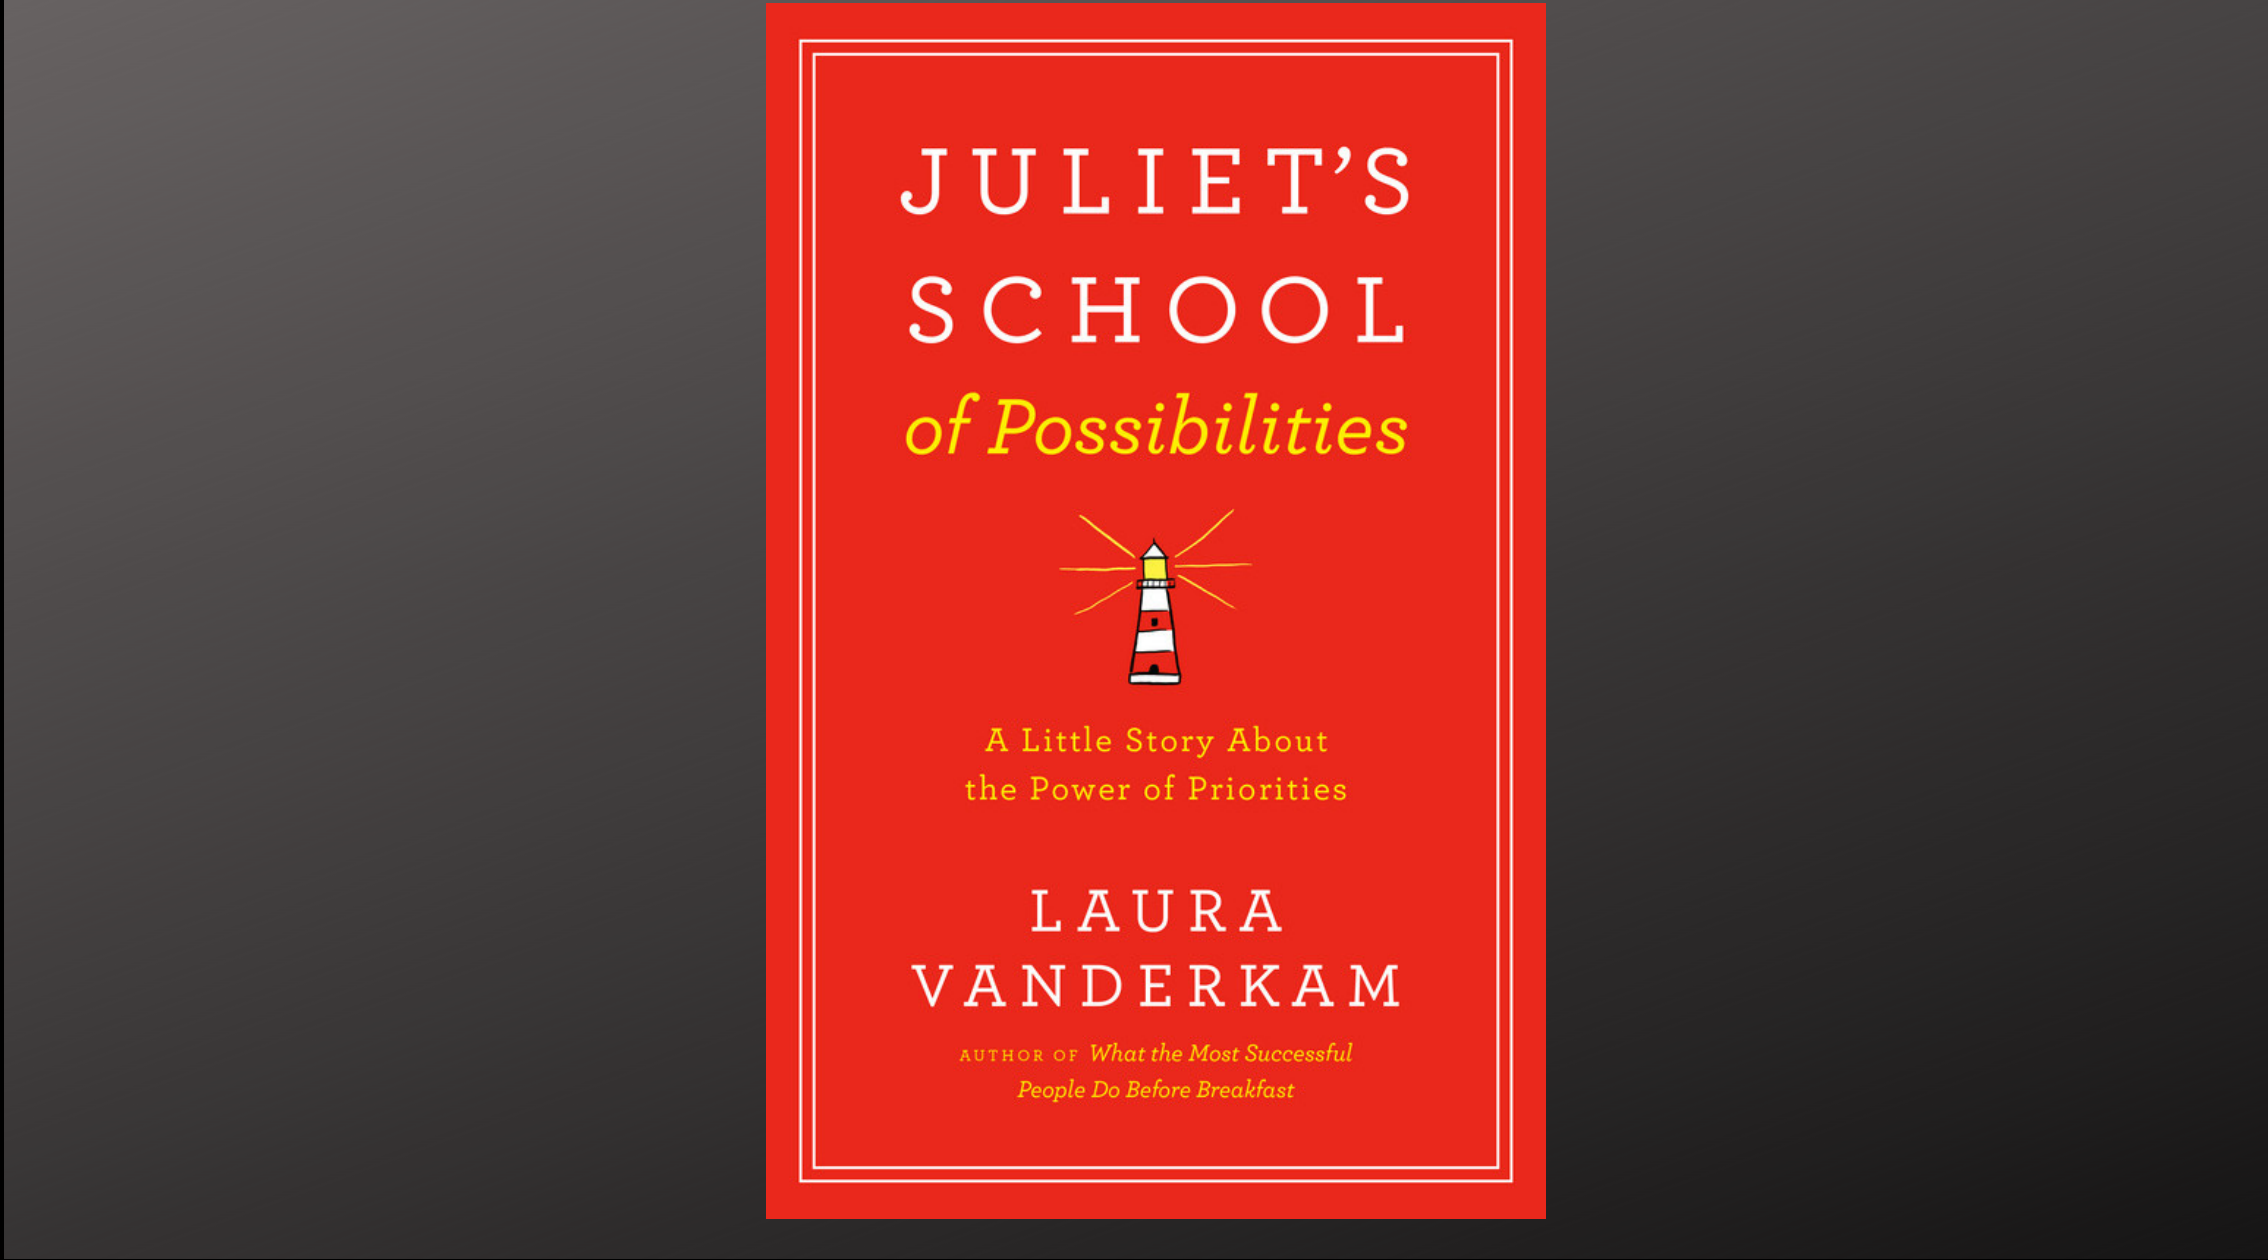 Laura Vanderkam book, Juliet's School of Possibilities. COURTESY OF PORTFOLIO BOOKS